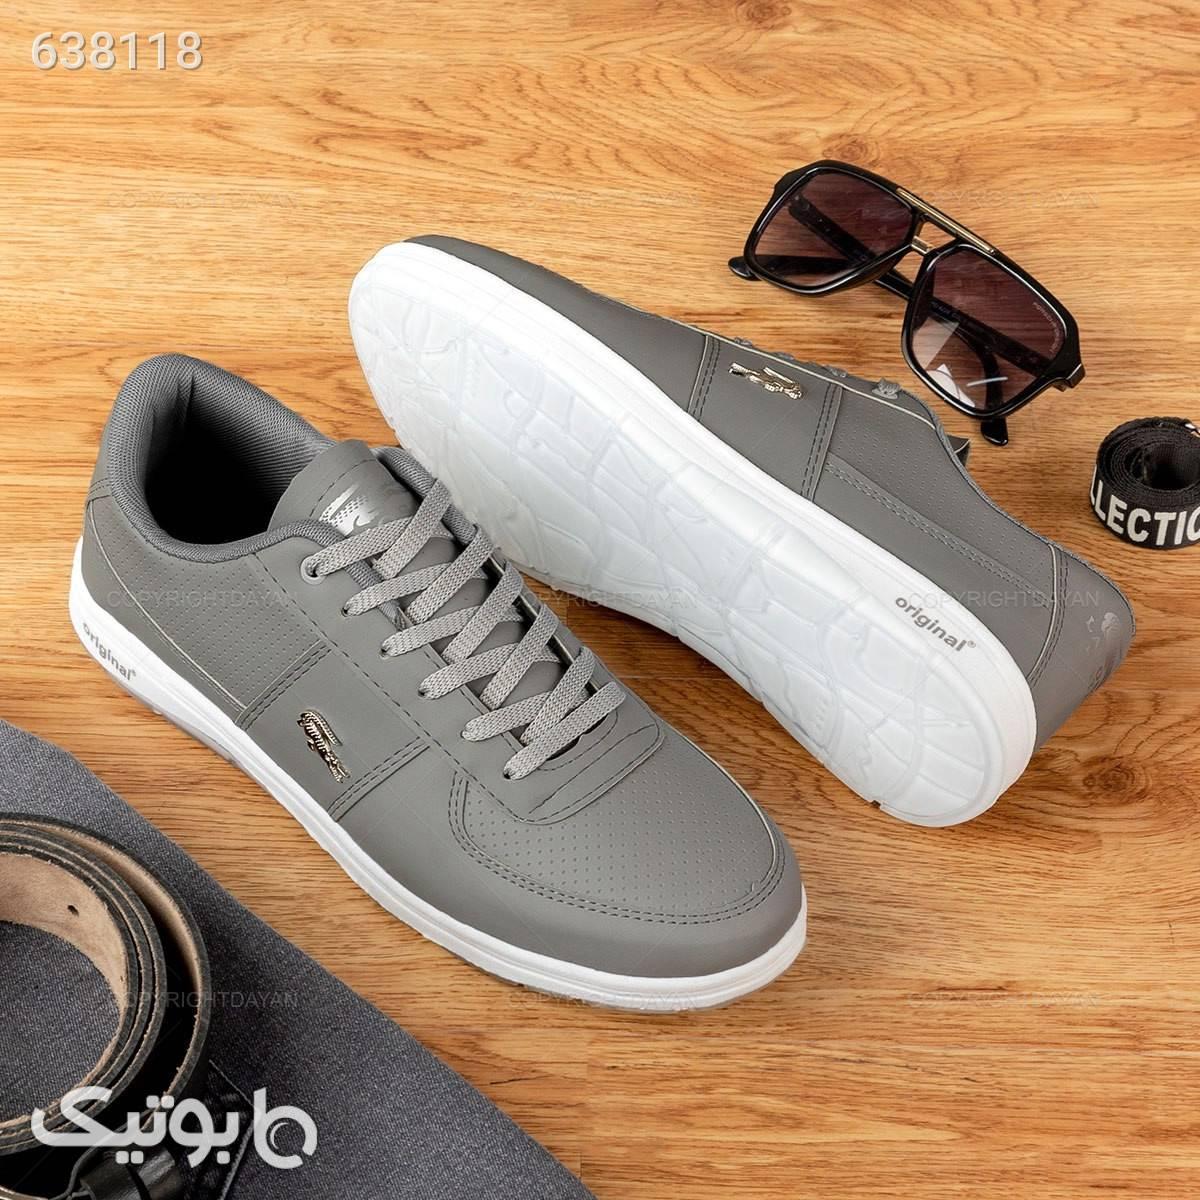 کفش مردانه لاگوست  نقره ای كفش مردانه